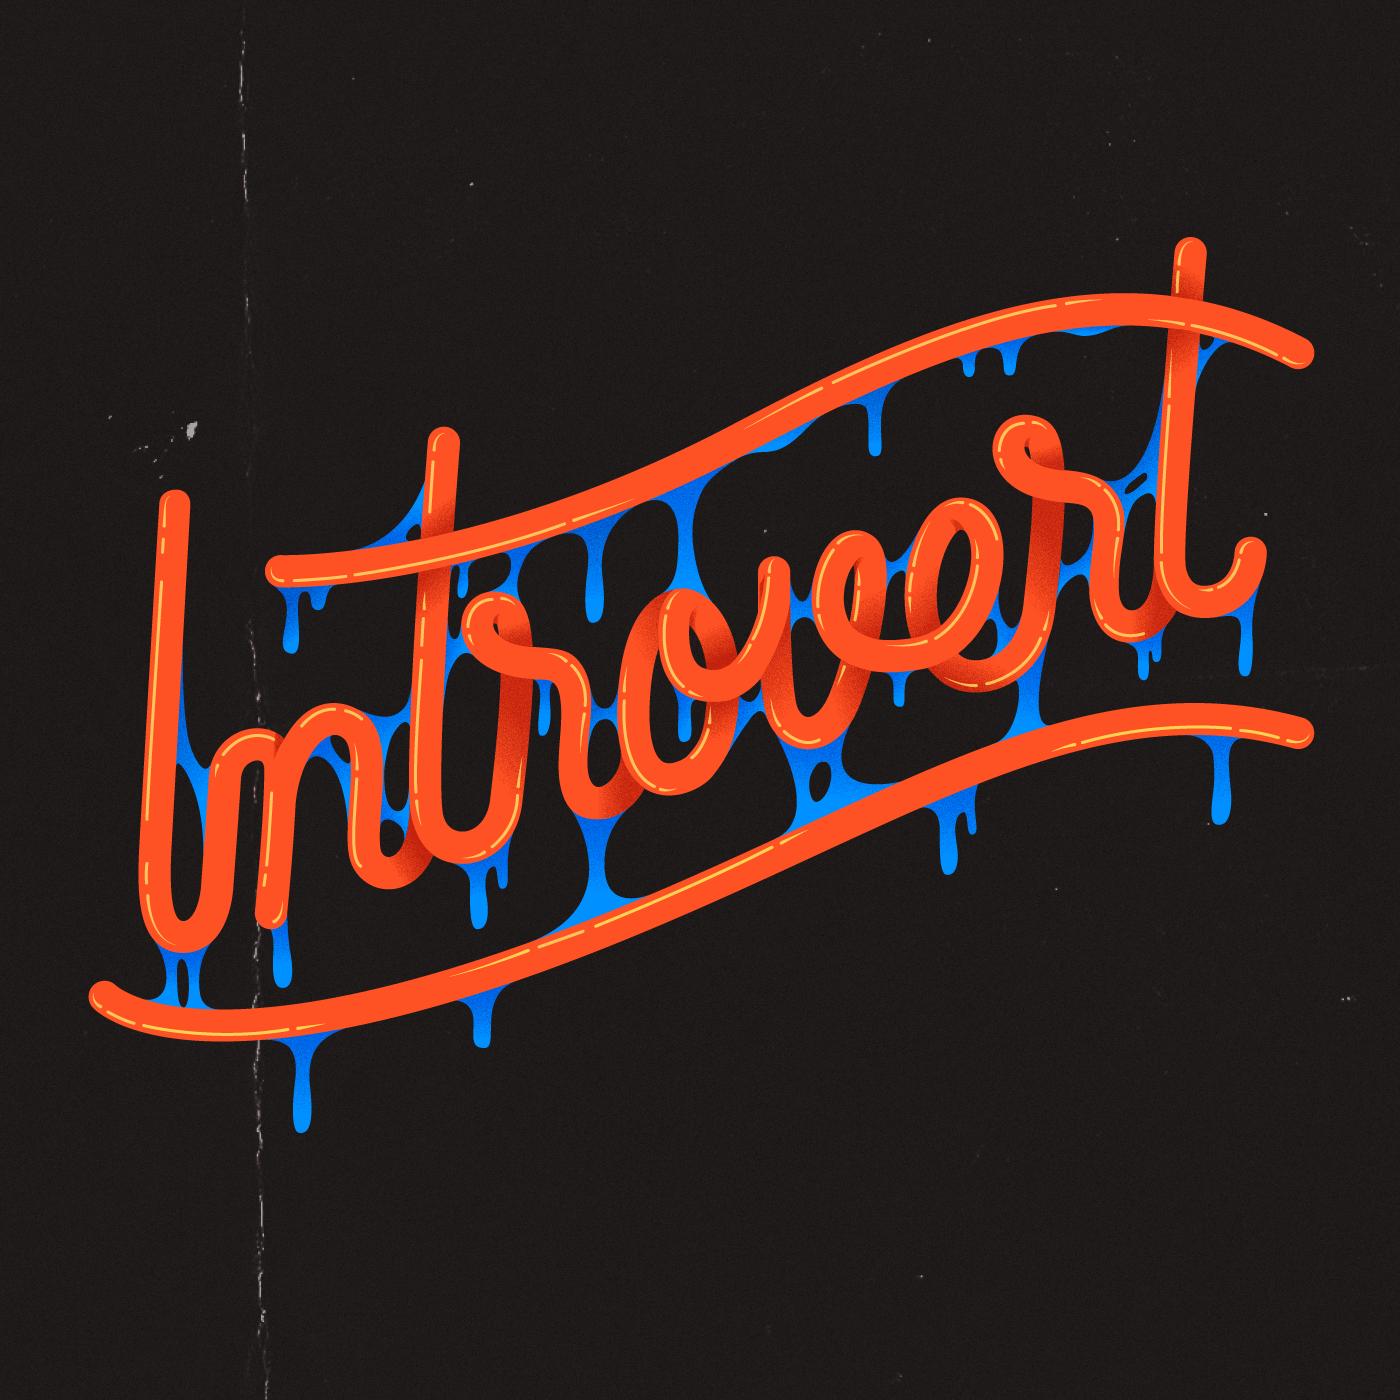 samantha lee introvert.png